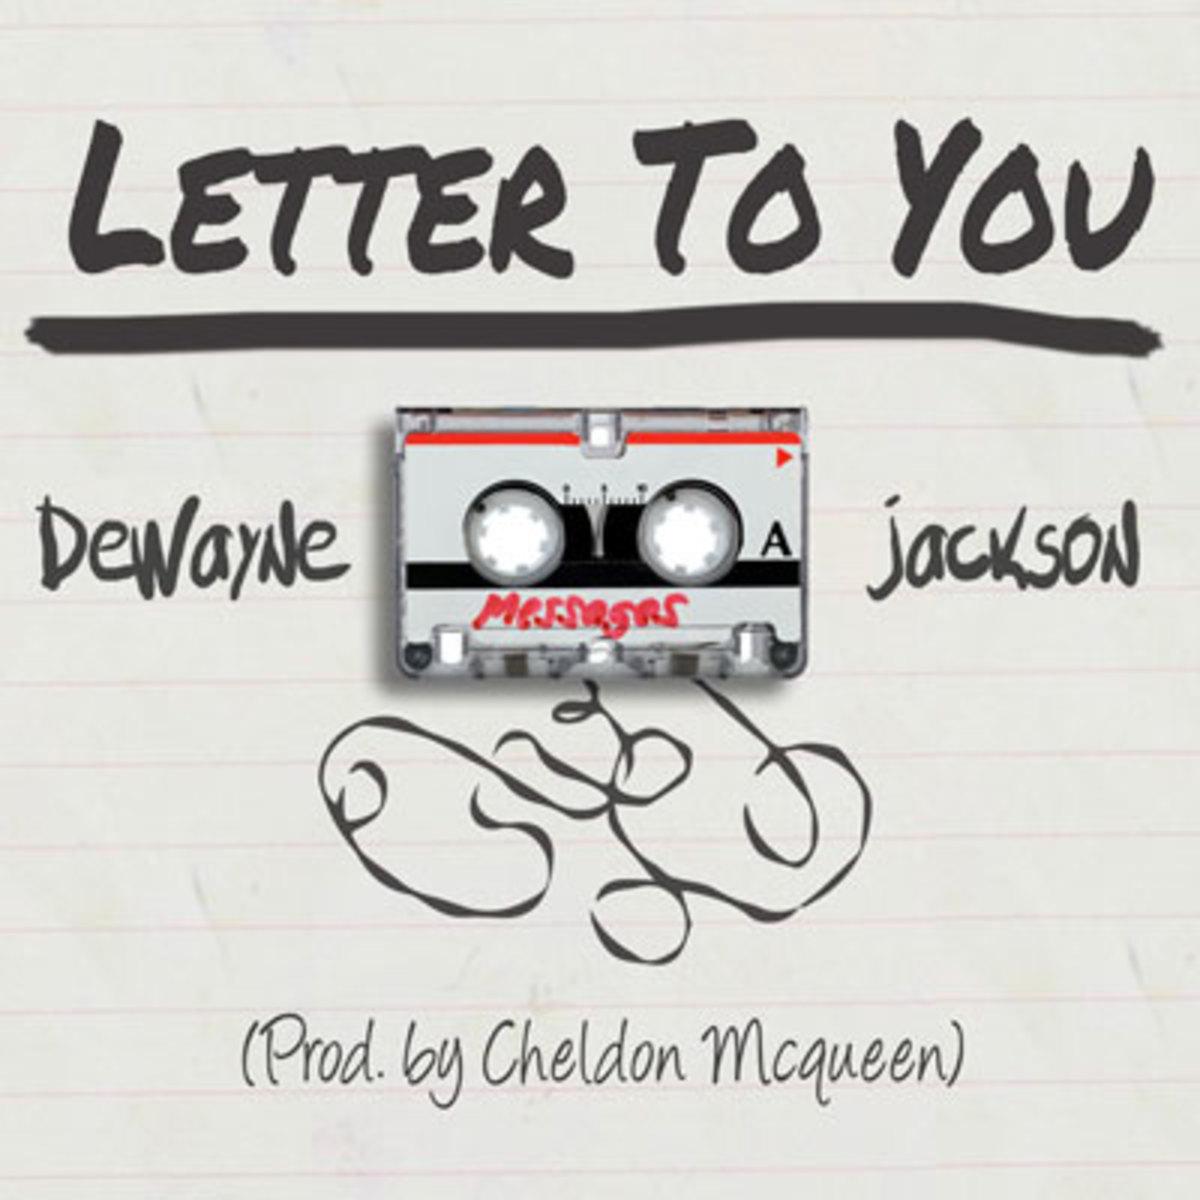 dewaynejackson-lettertoyou.jpg